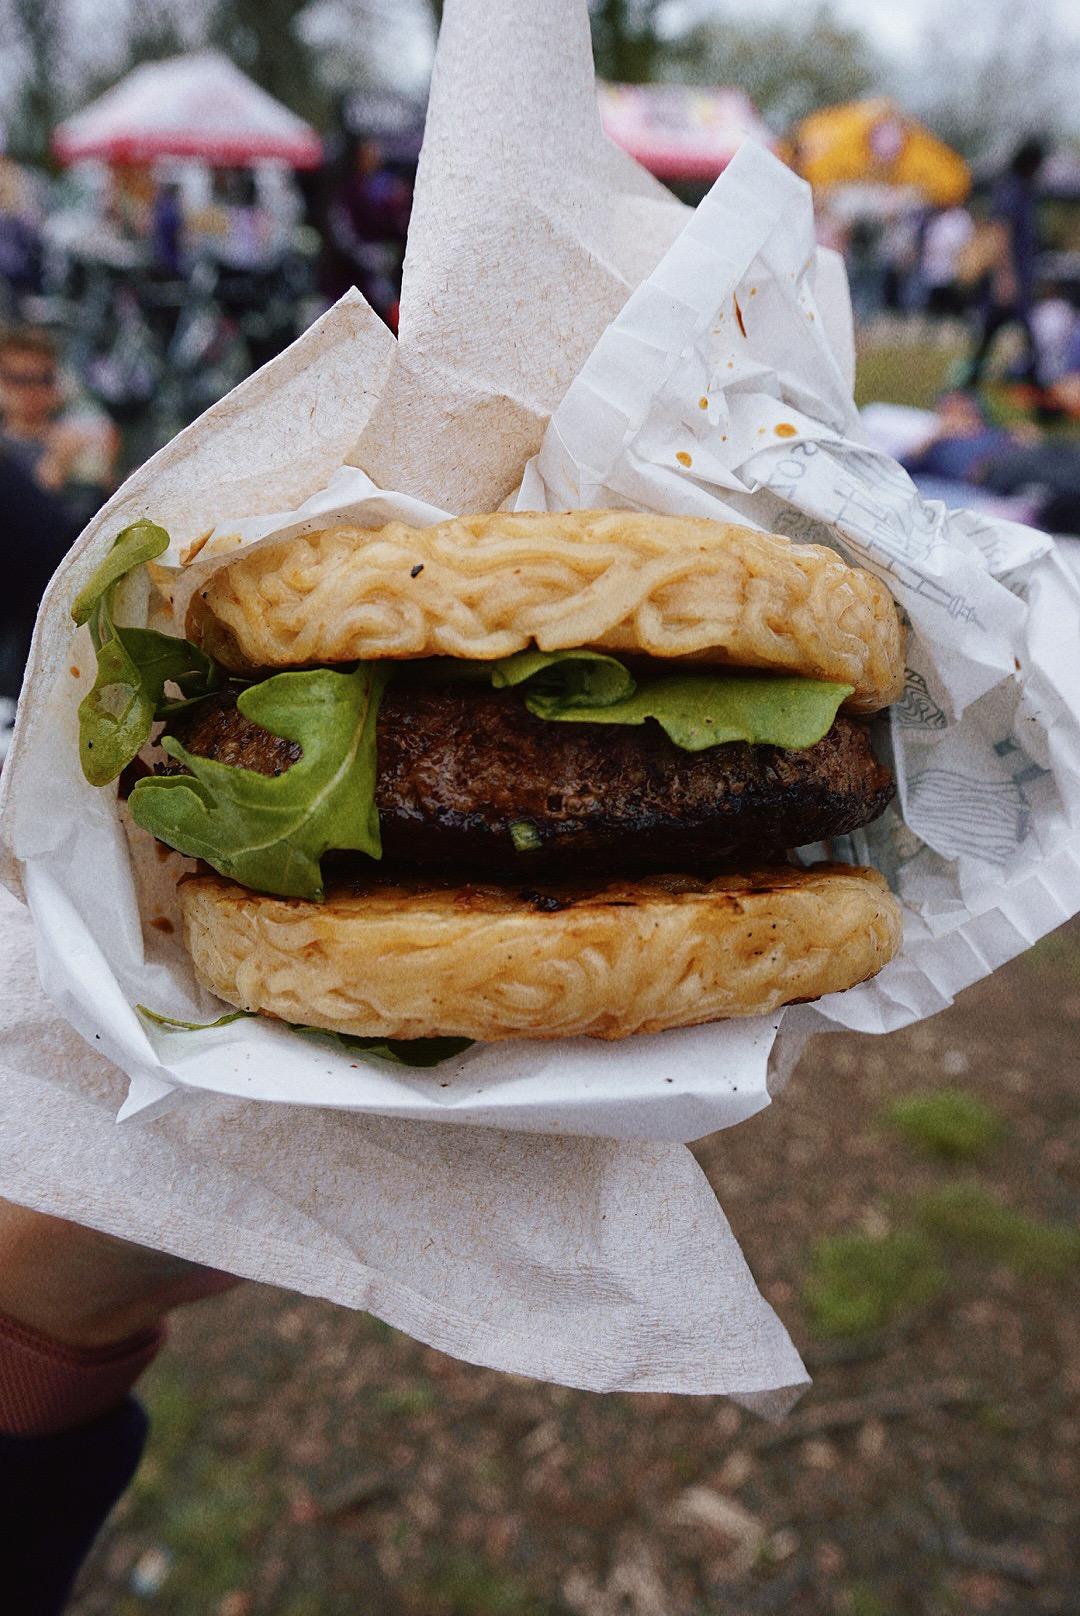 Ramen Burger from Ramen Burger by Keizo Shimamoto